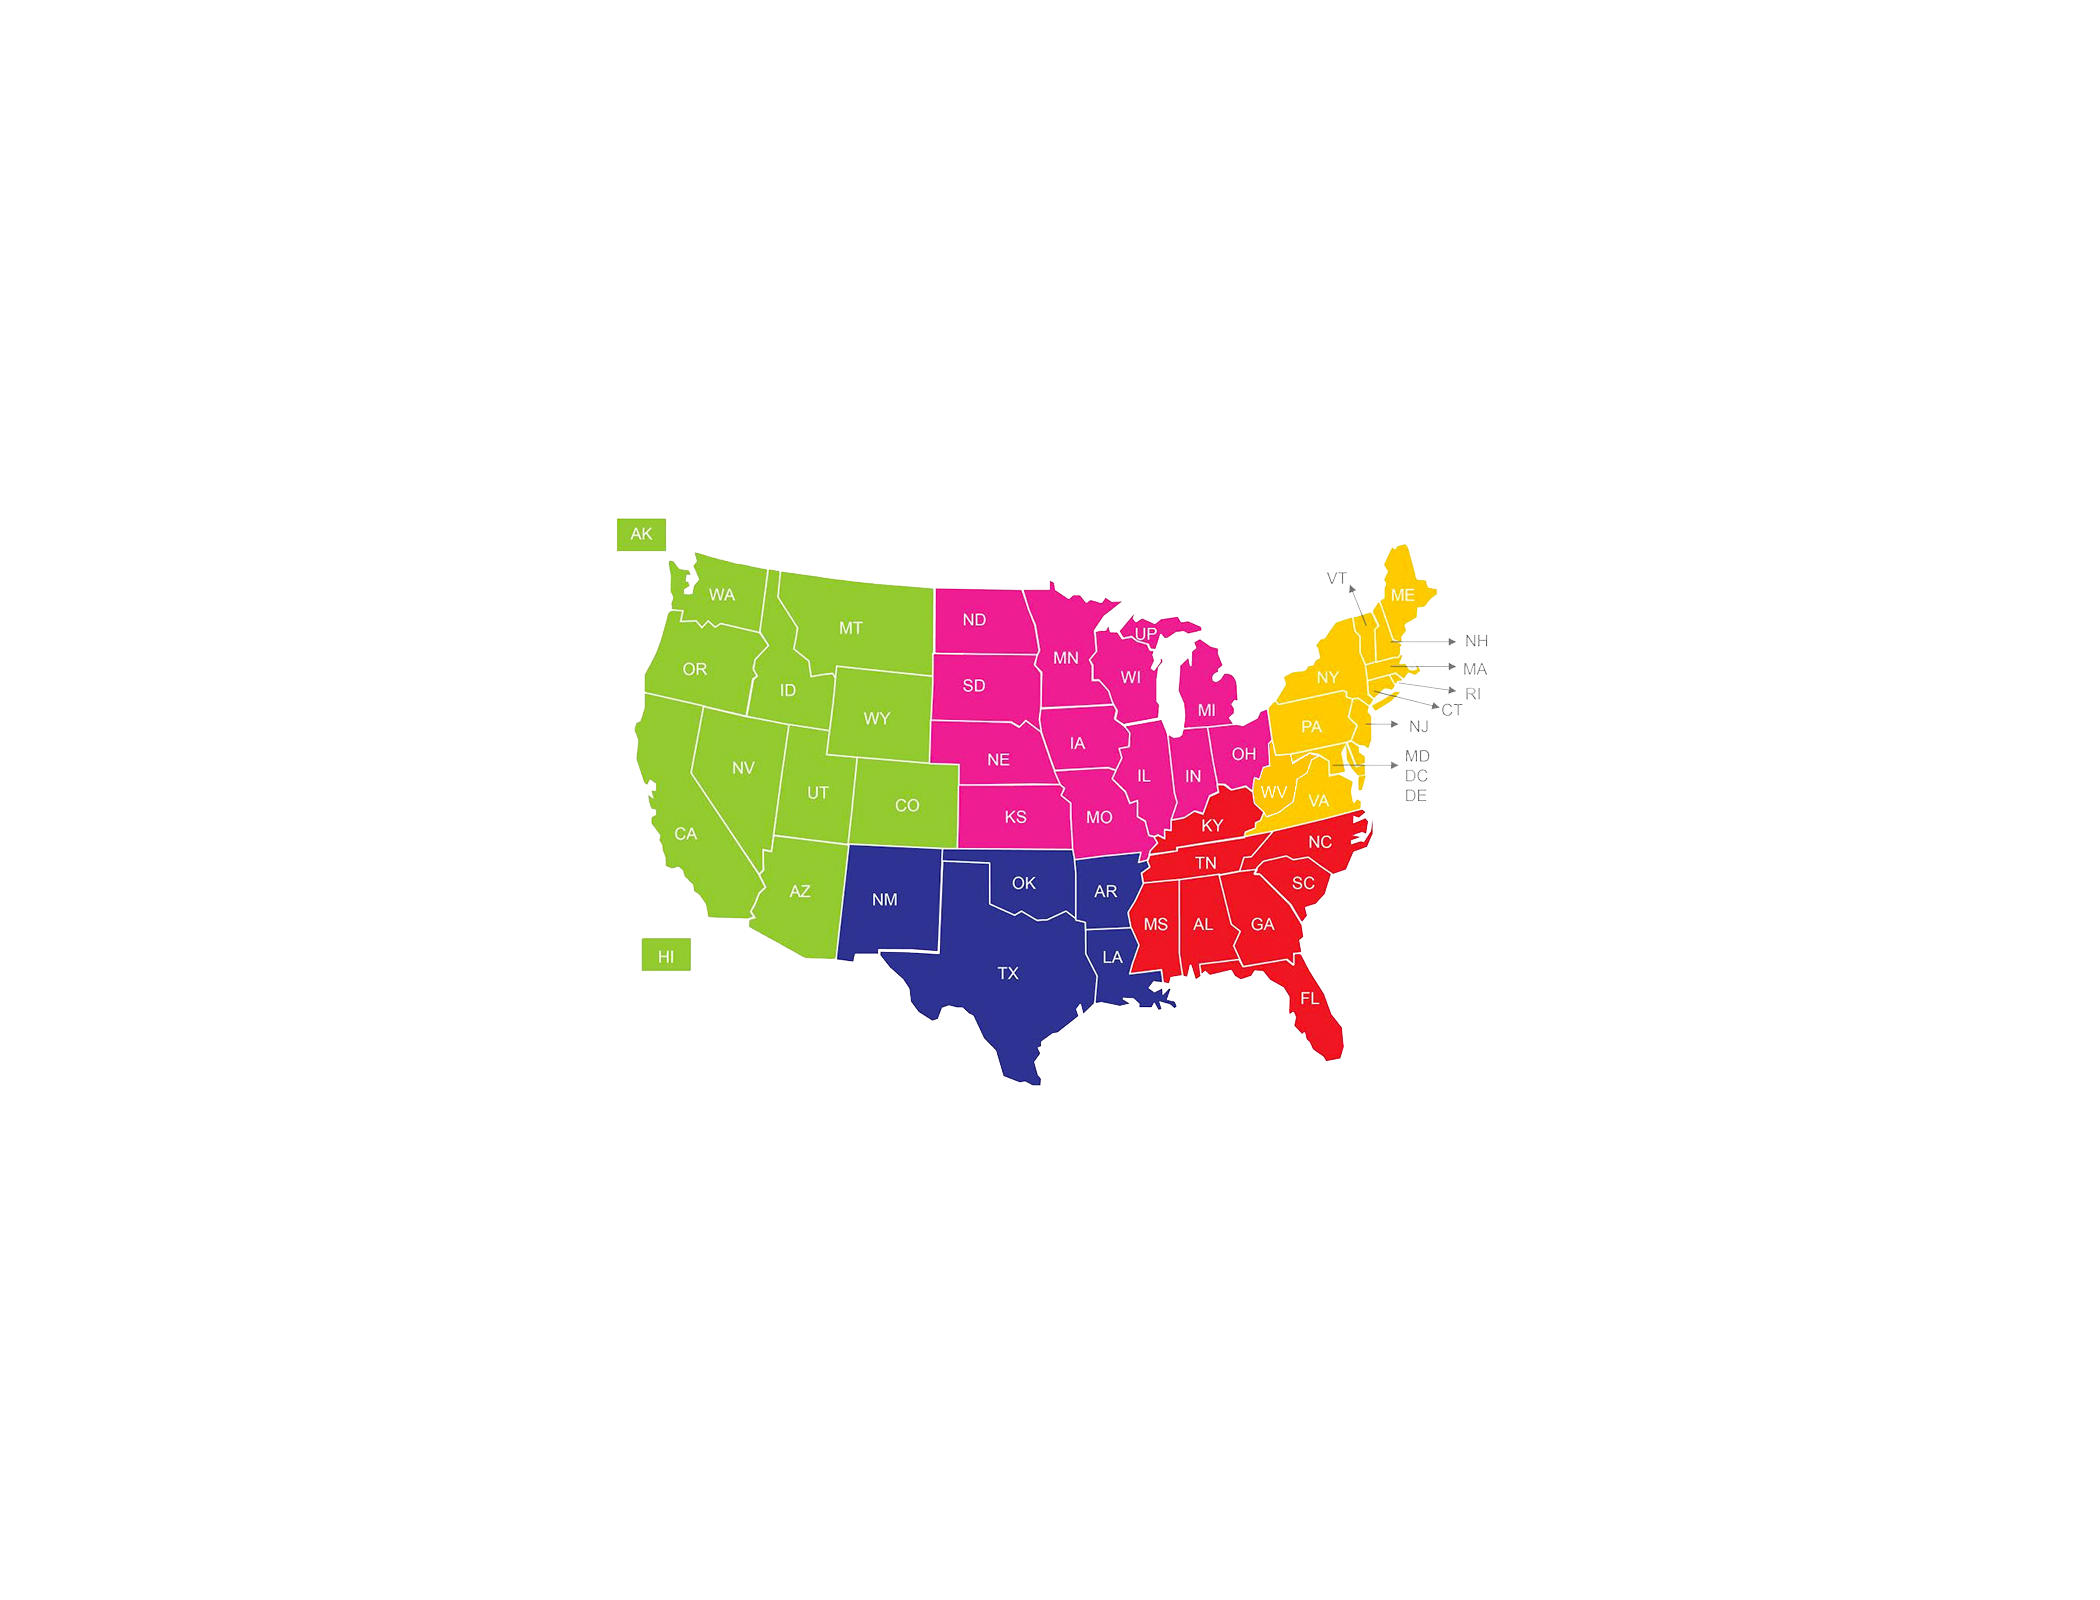 USASF Regional Map